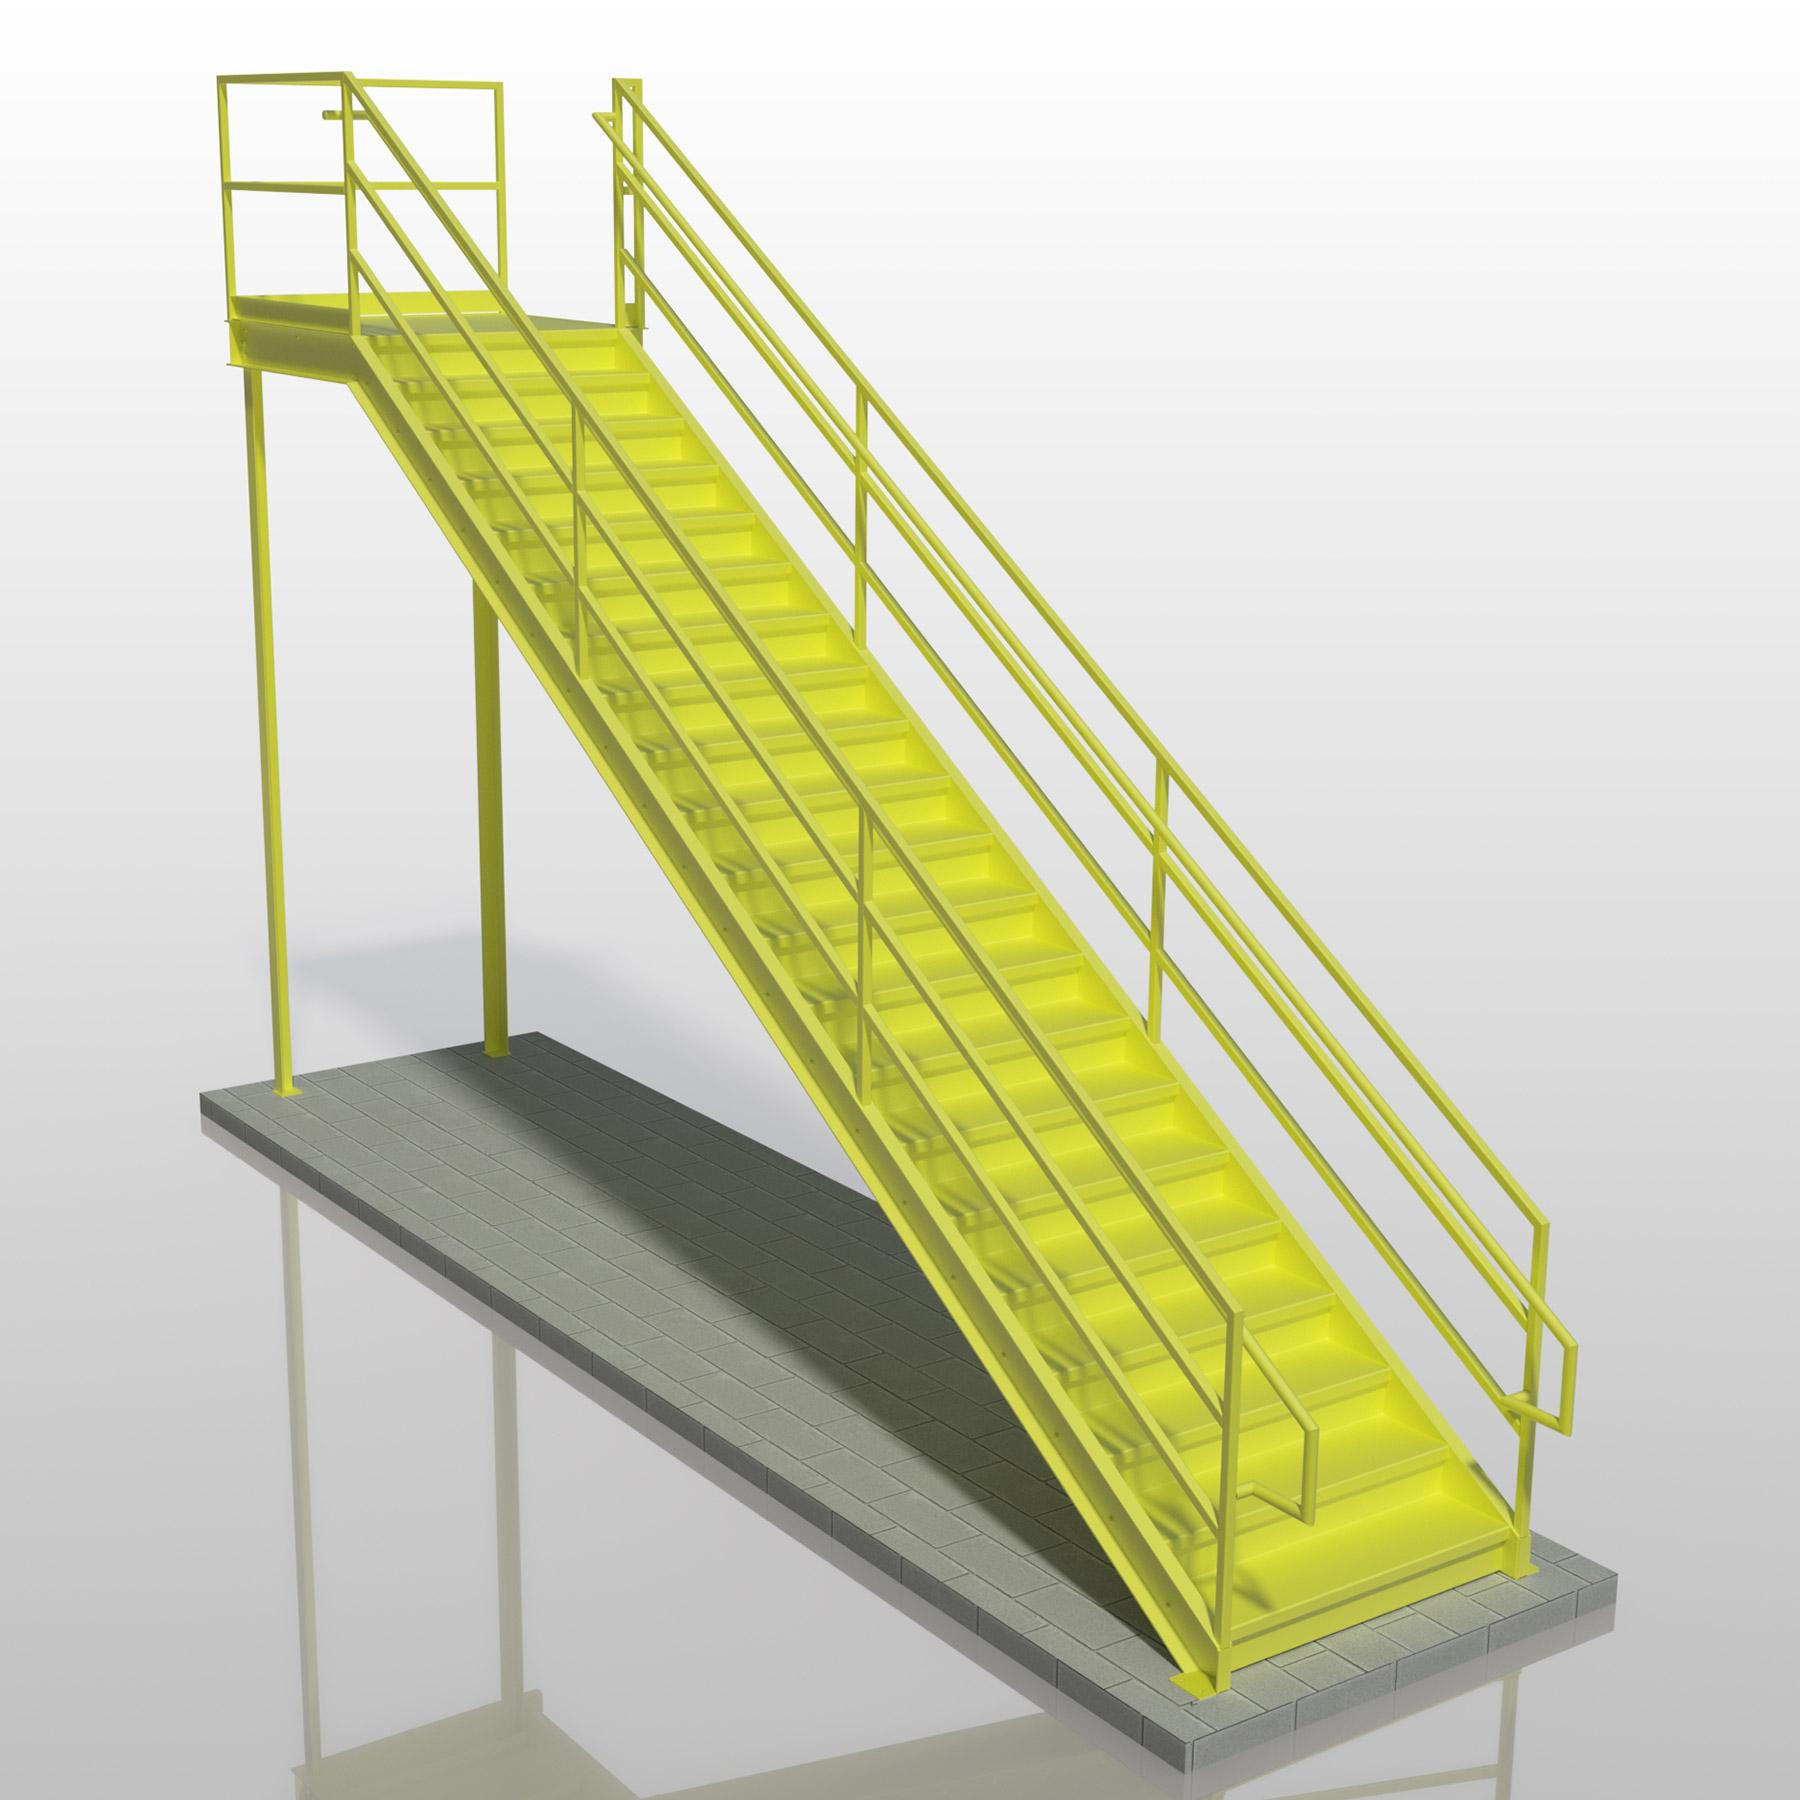 3 Rail Inner Handrail Stair